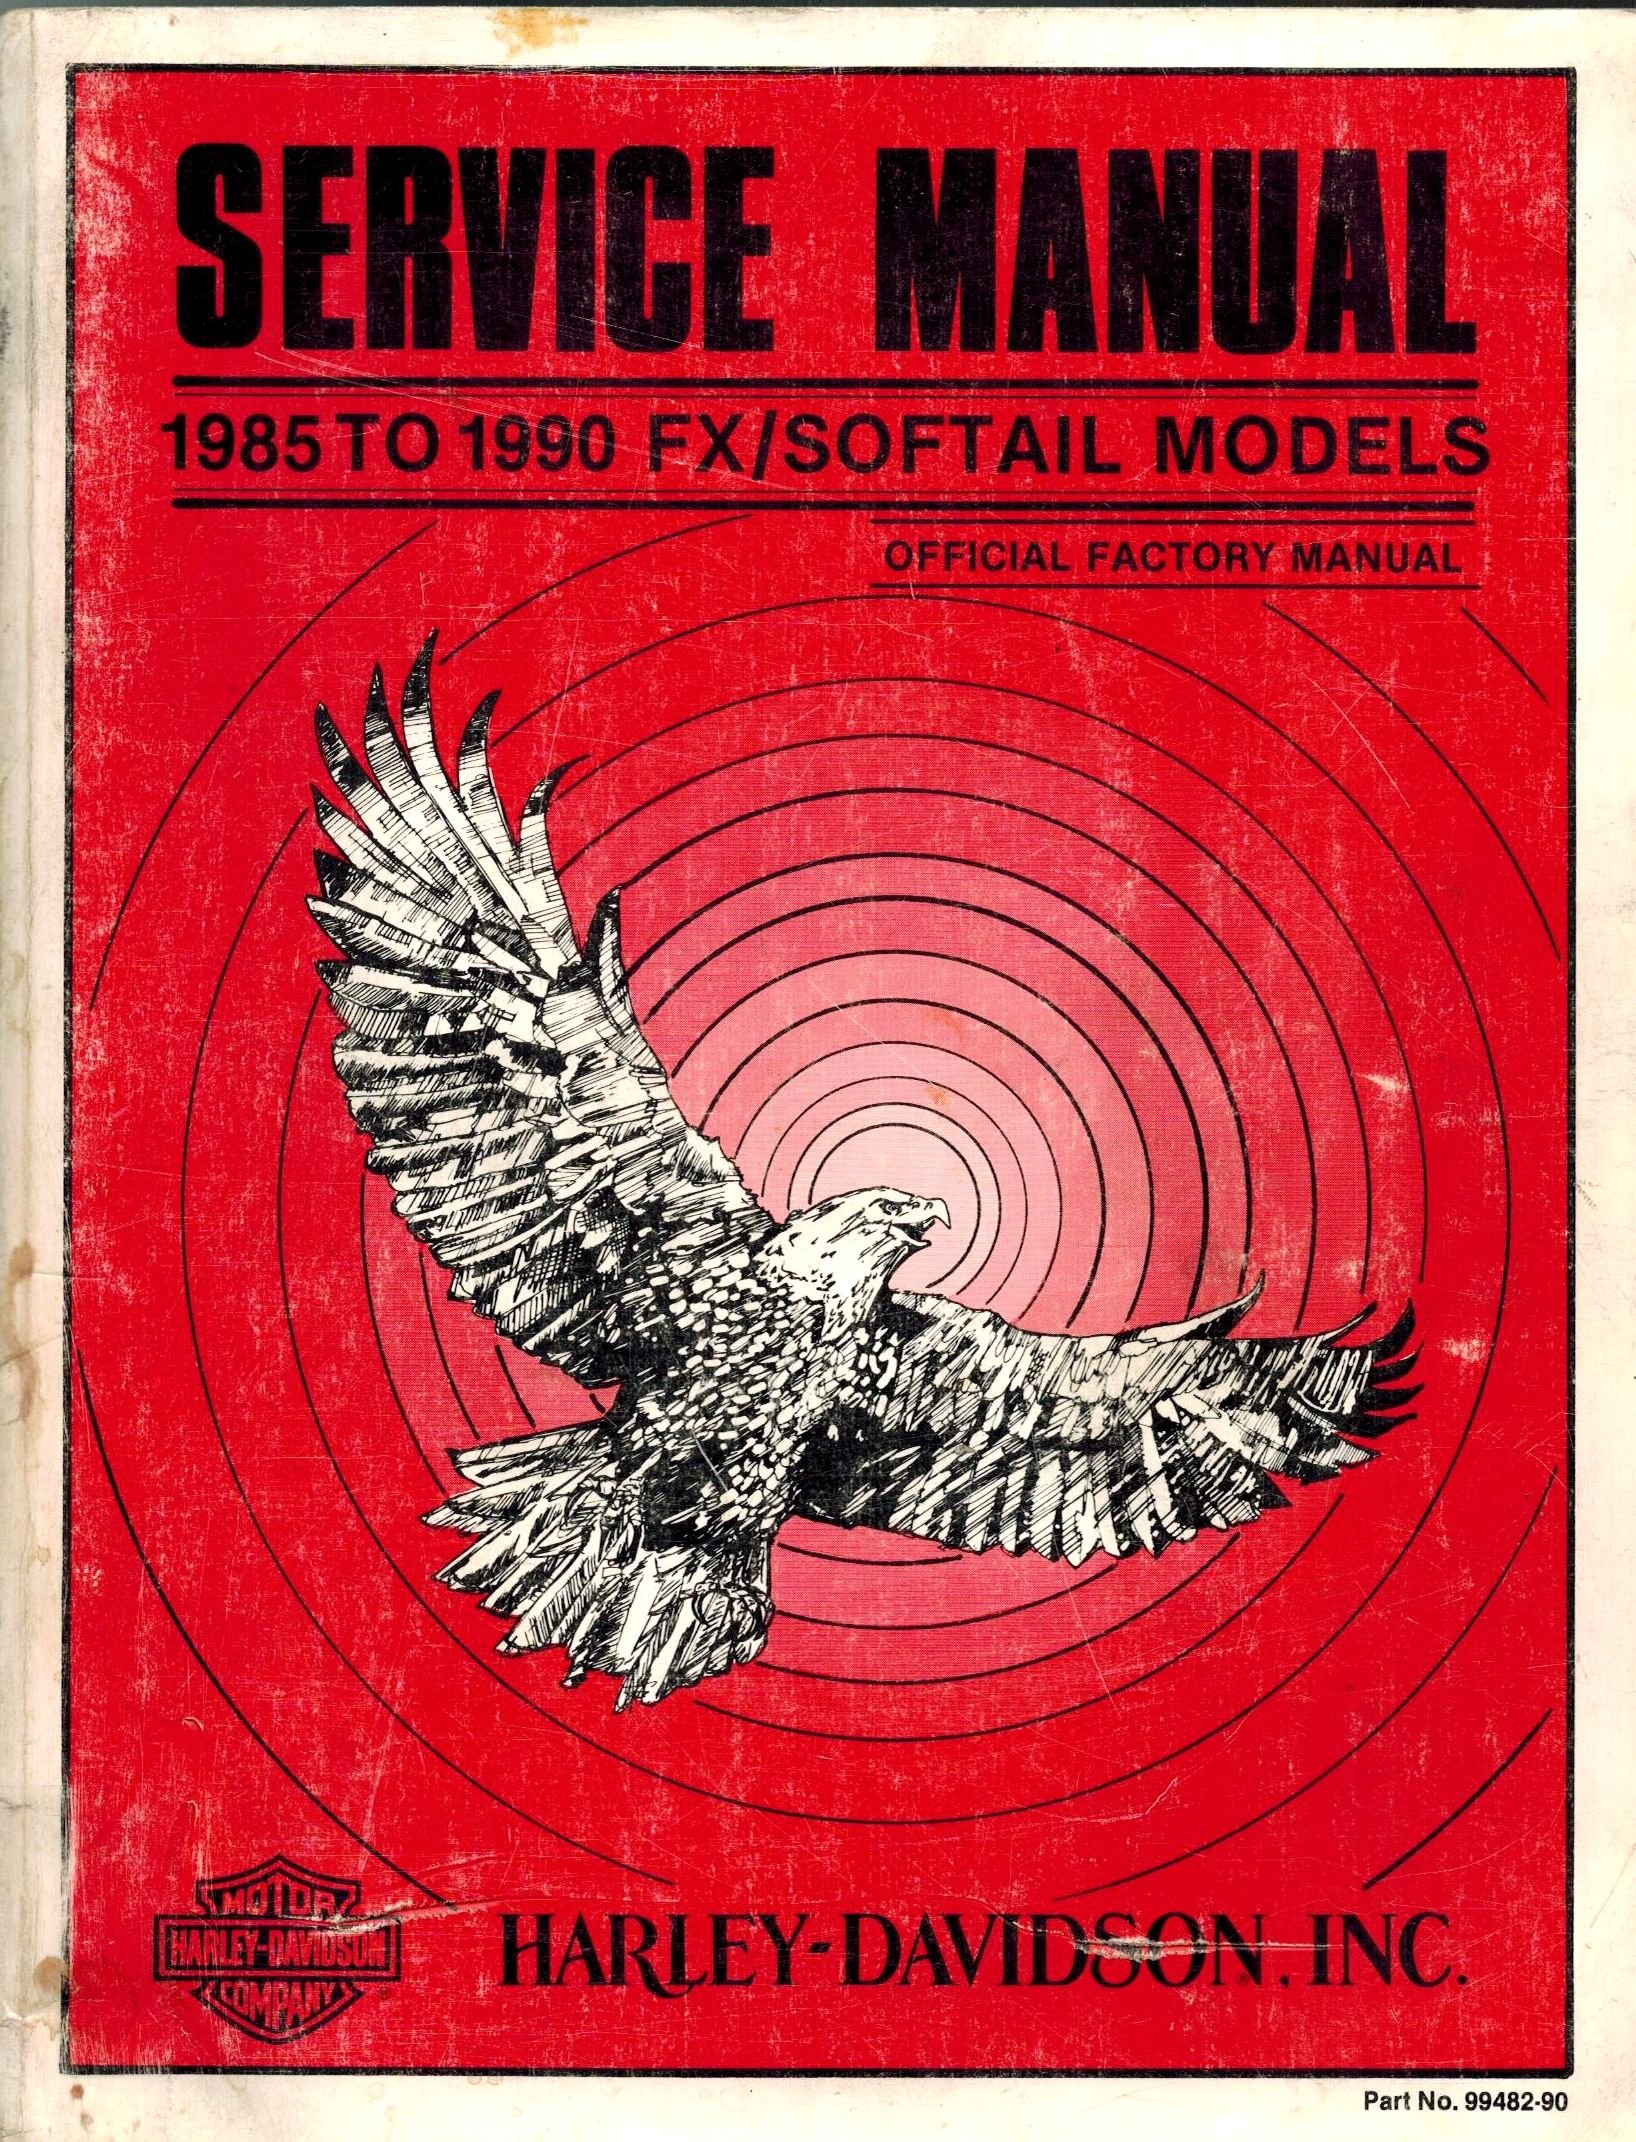 1985 To 1990 Fx/Softail Models Service Manual - Harley Davidson: Harley- davidson: Amazon.com: Books